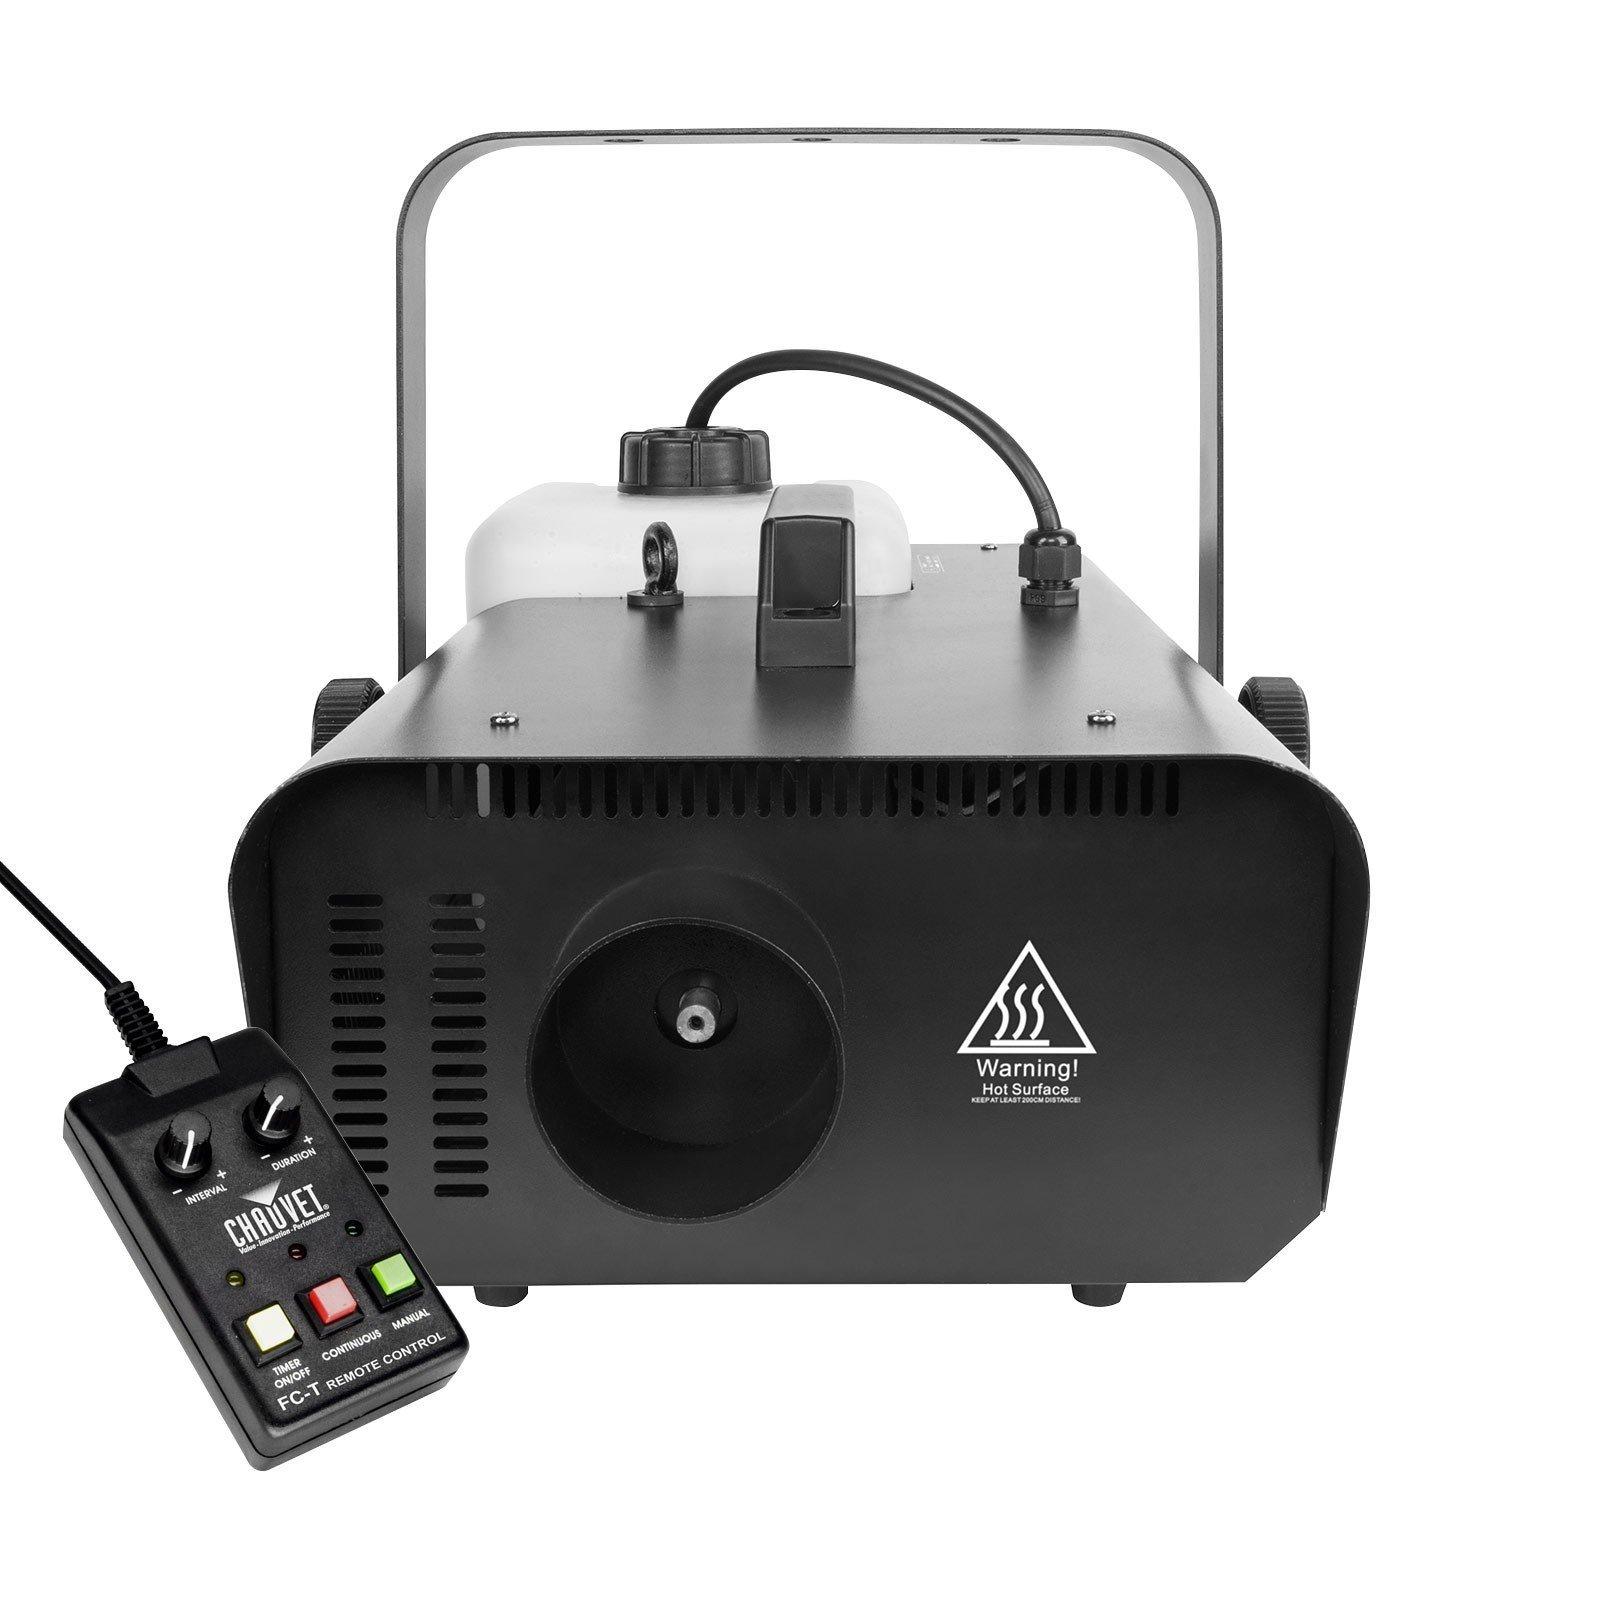 Chauvet DJ Hurricane 1302 Compact 20K CFM Fog Smoke Effect Machine Timer Remote (Renewed)